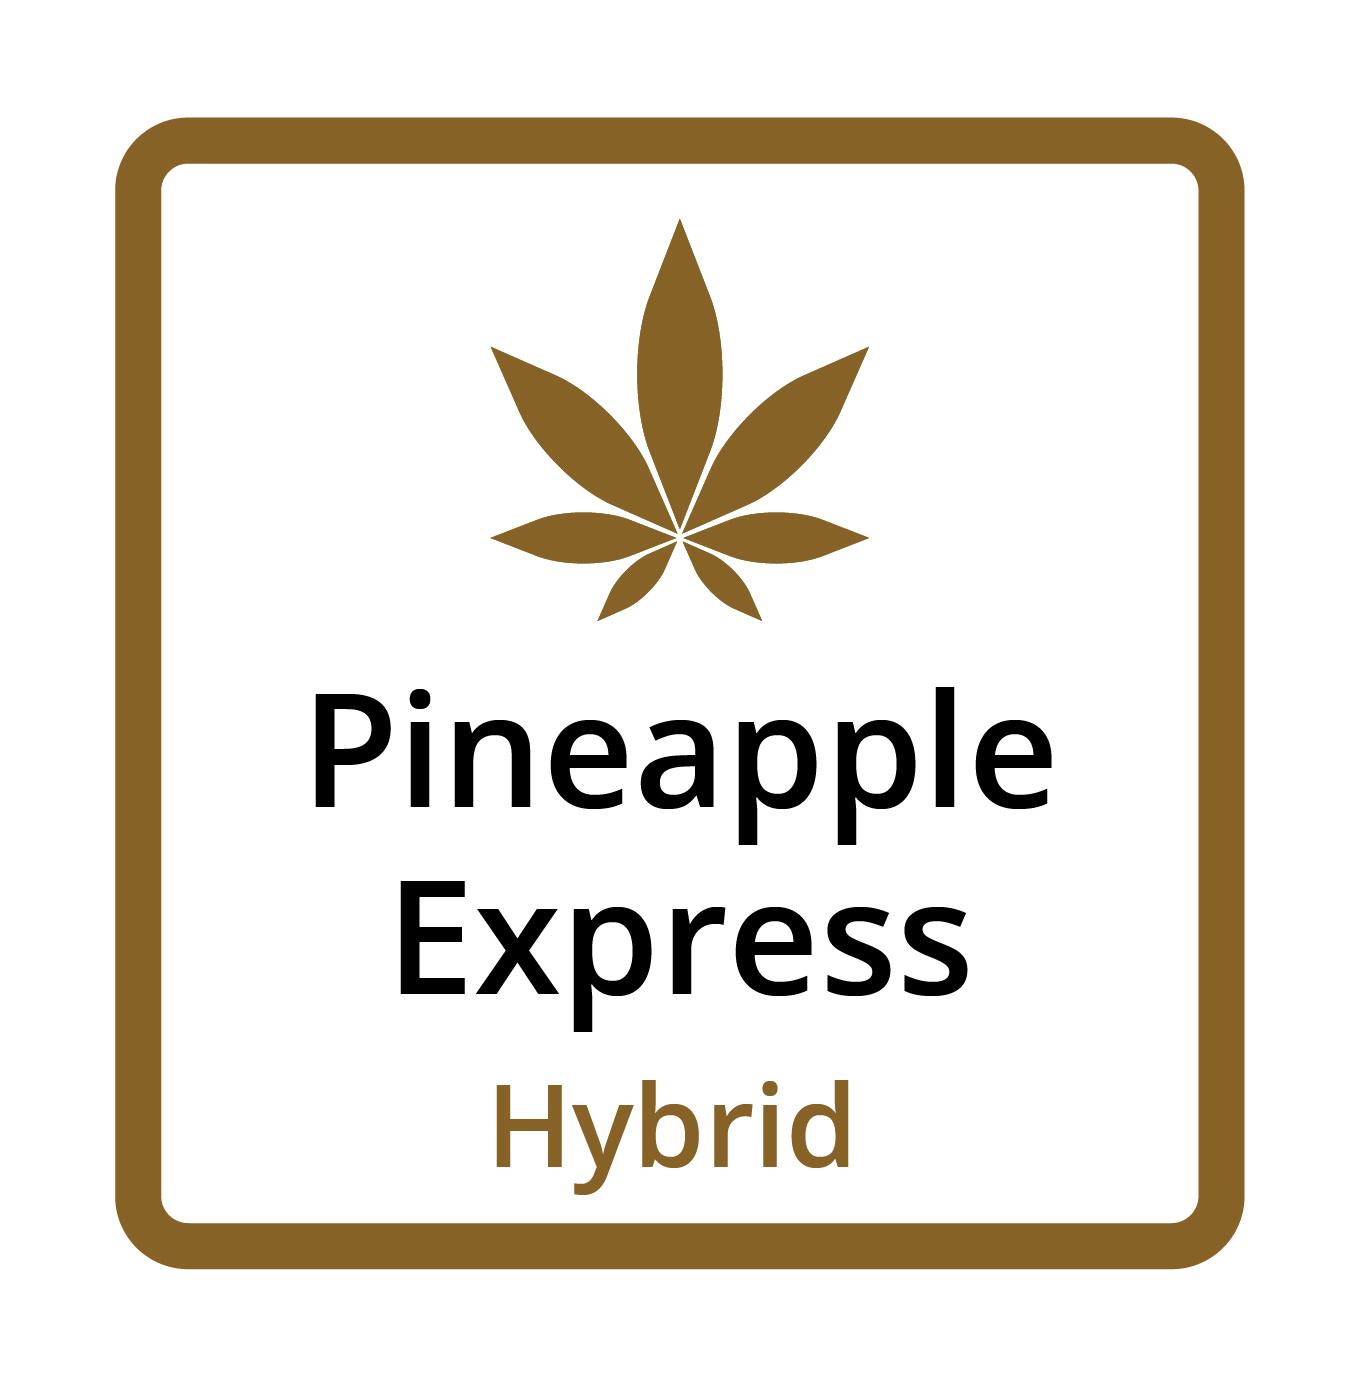 Pineapple Express (Hybrid)